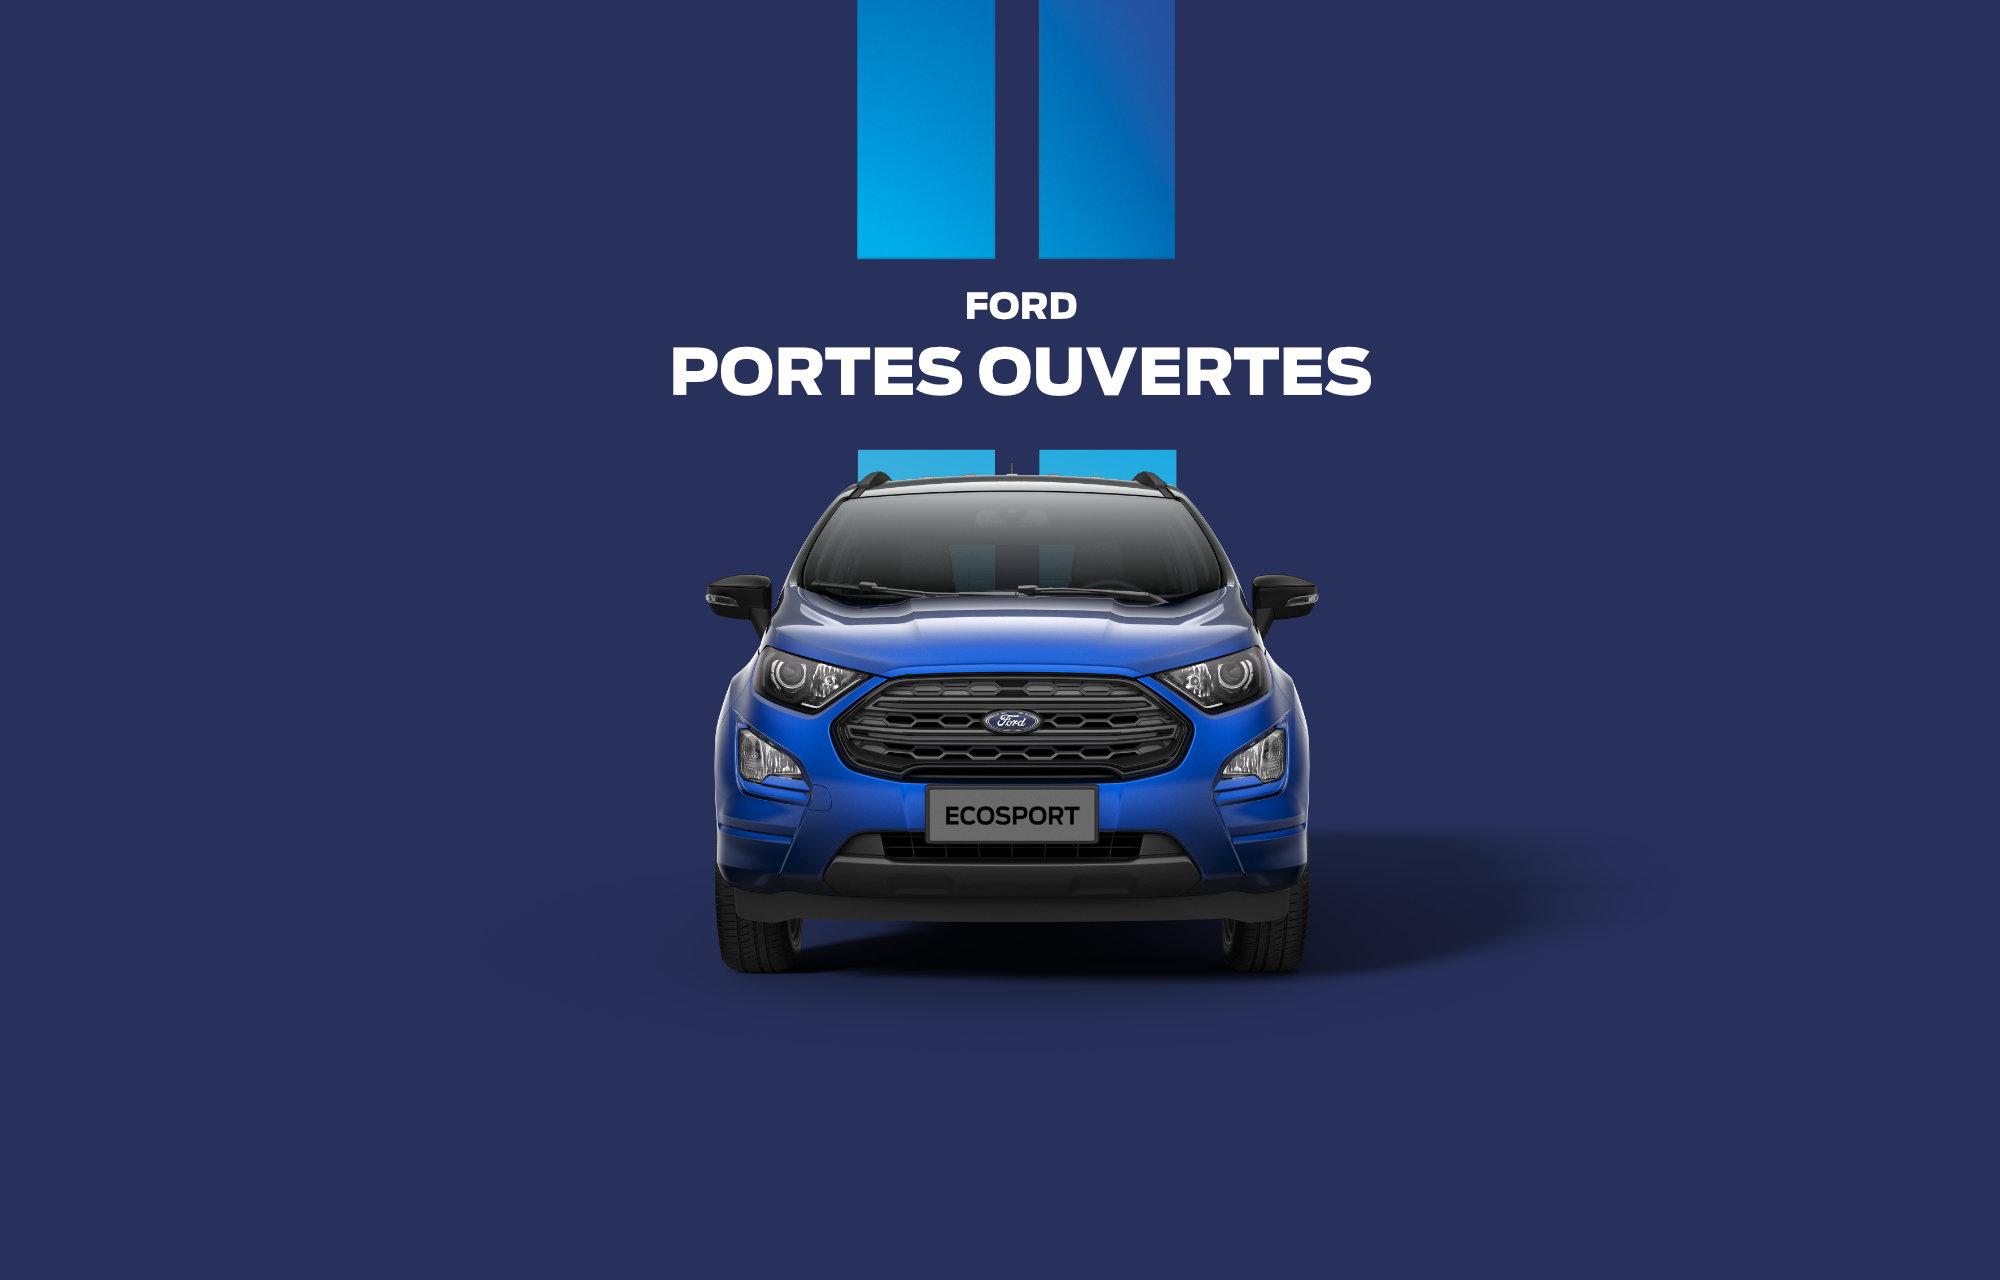 **Portes Ouvertes Ford**